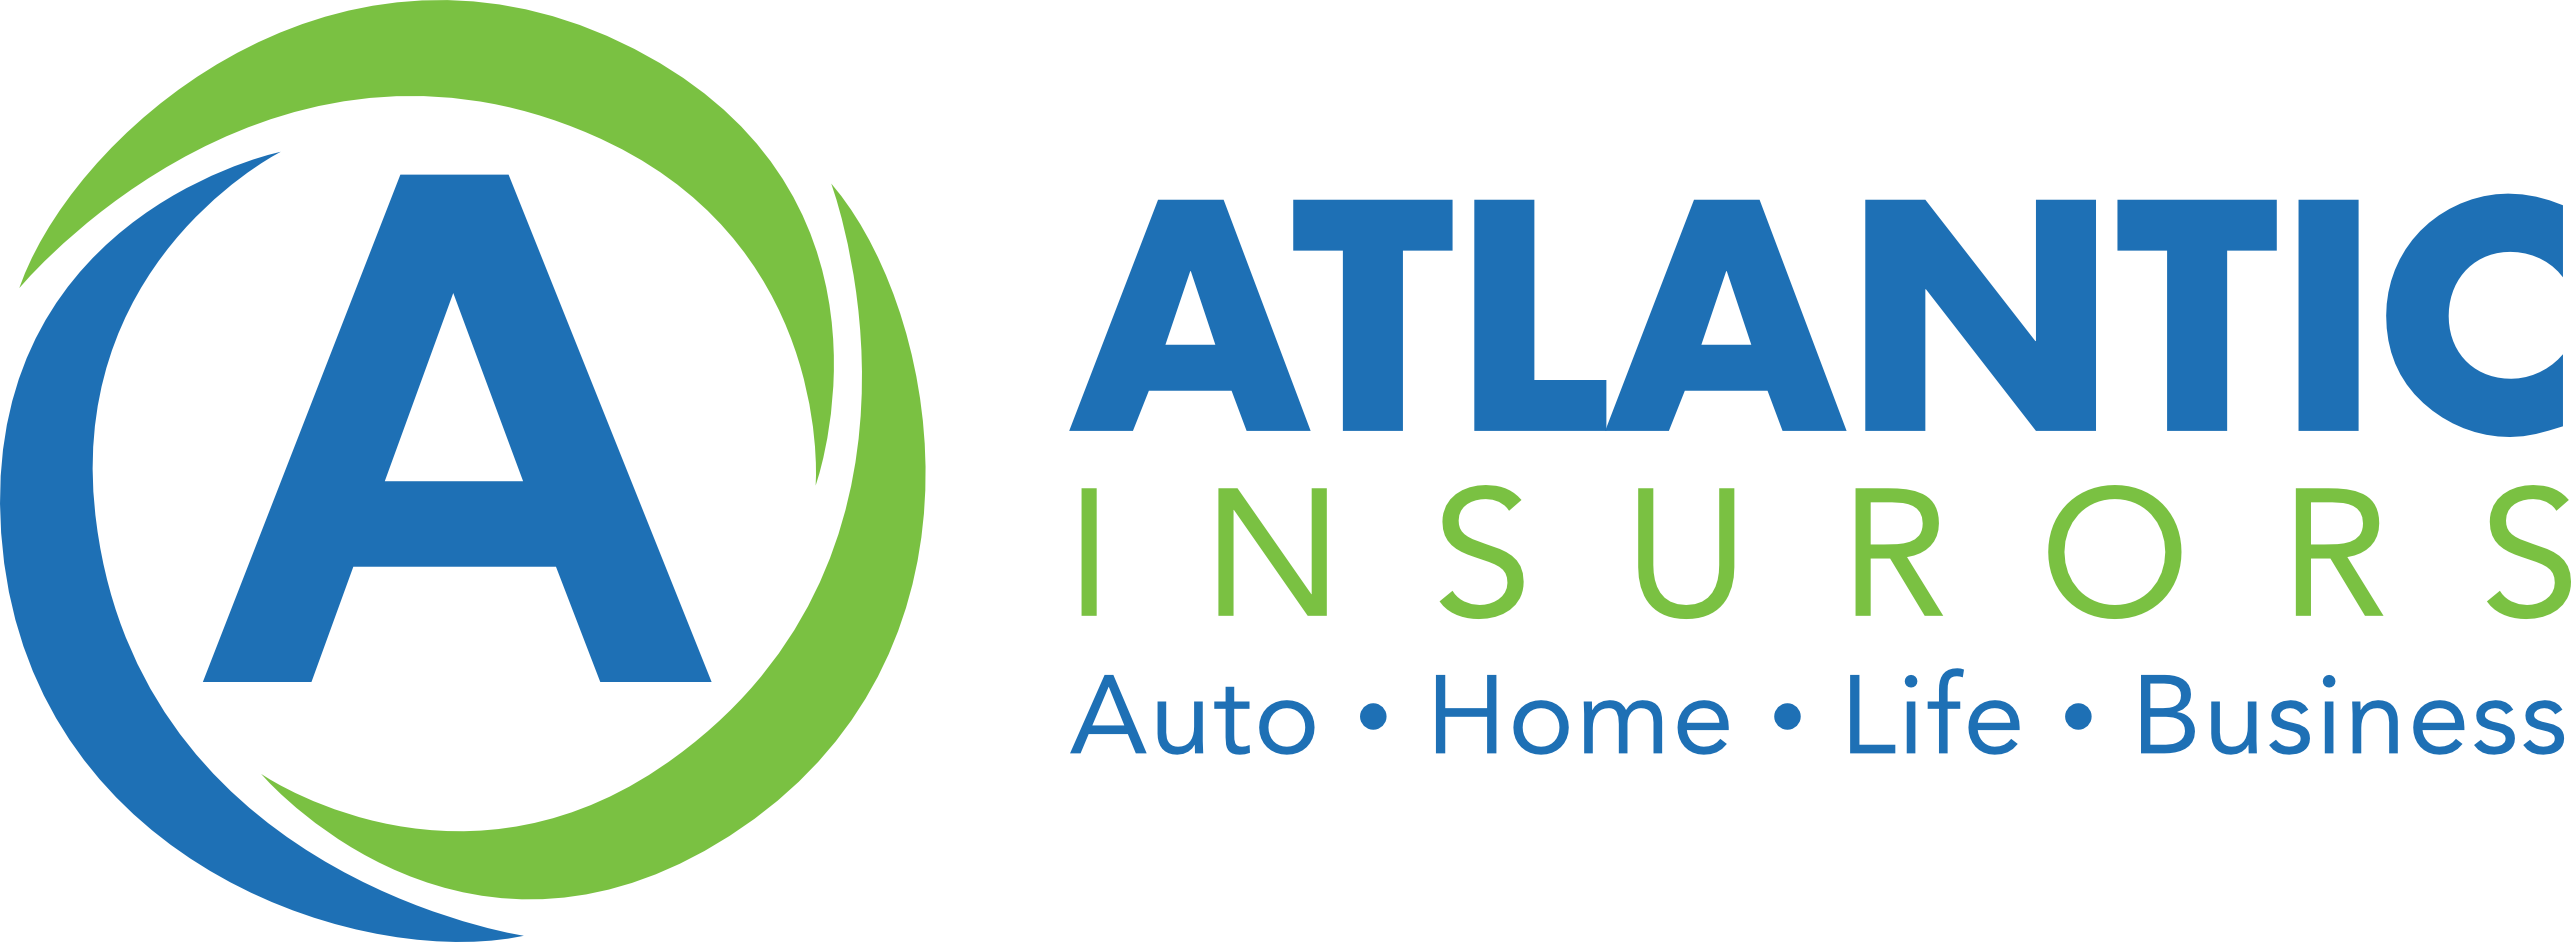 AtlanticInsurors_logo_horizontal_tagline